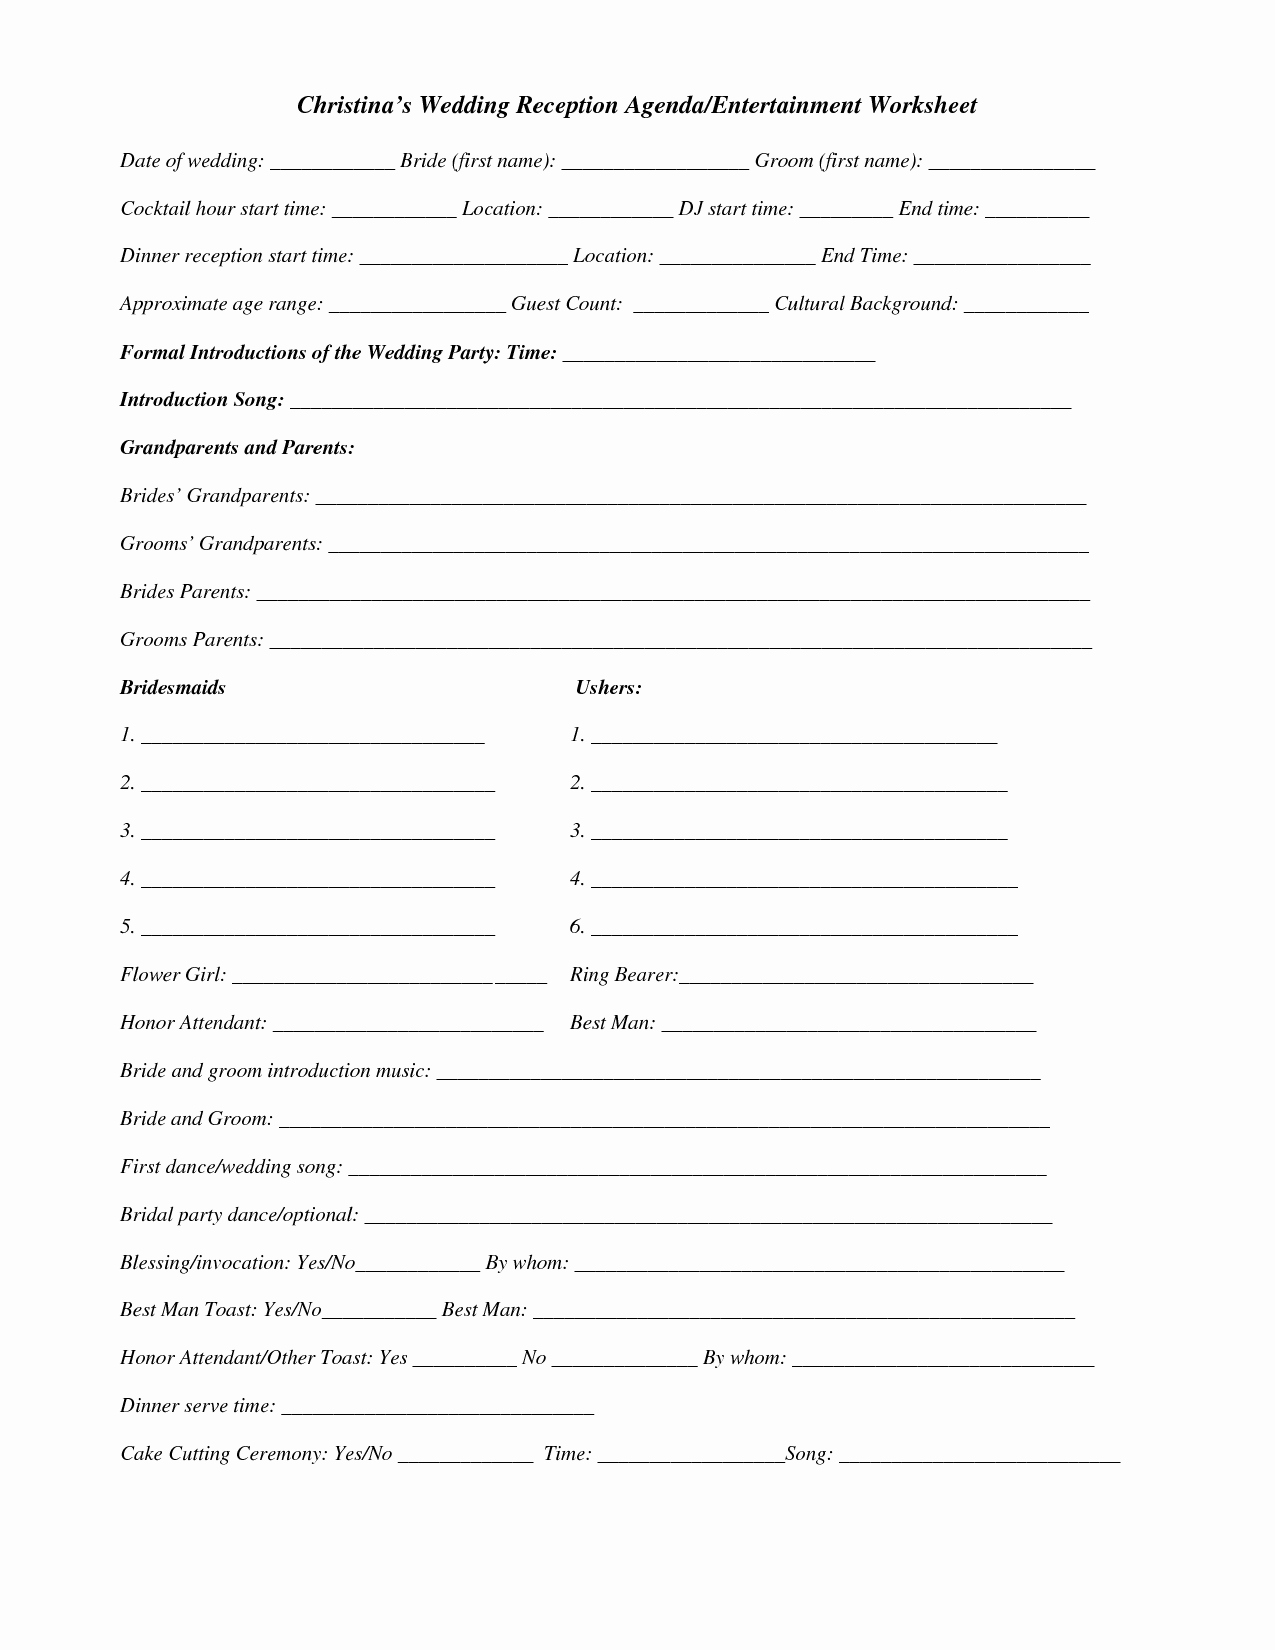 Wedding Guest List Worksheet Printable Fresh 15 Best Of Wedding Guest List Worksheets